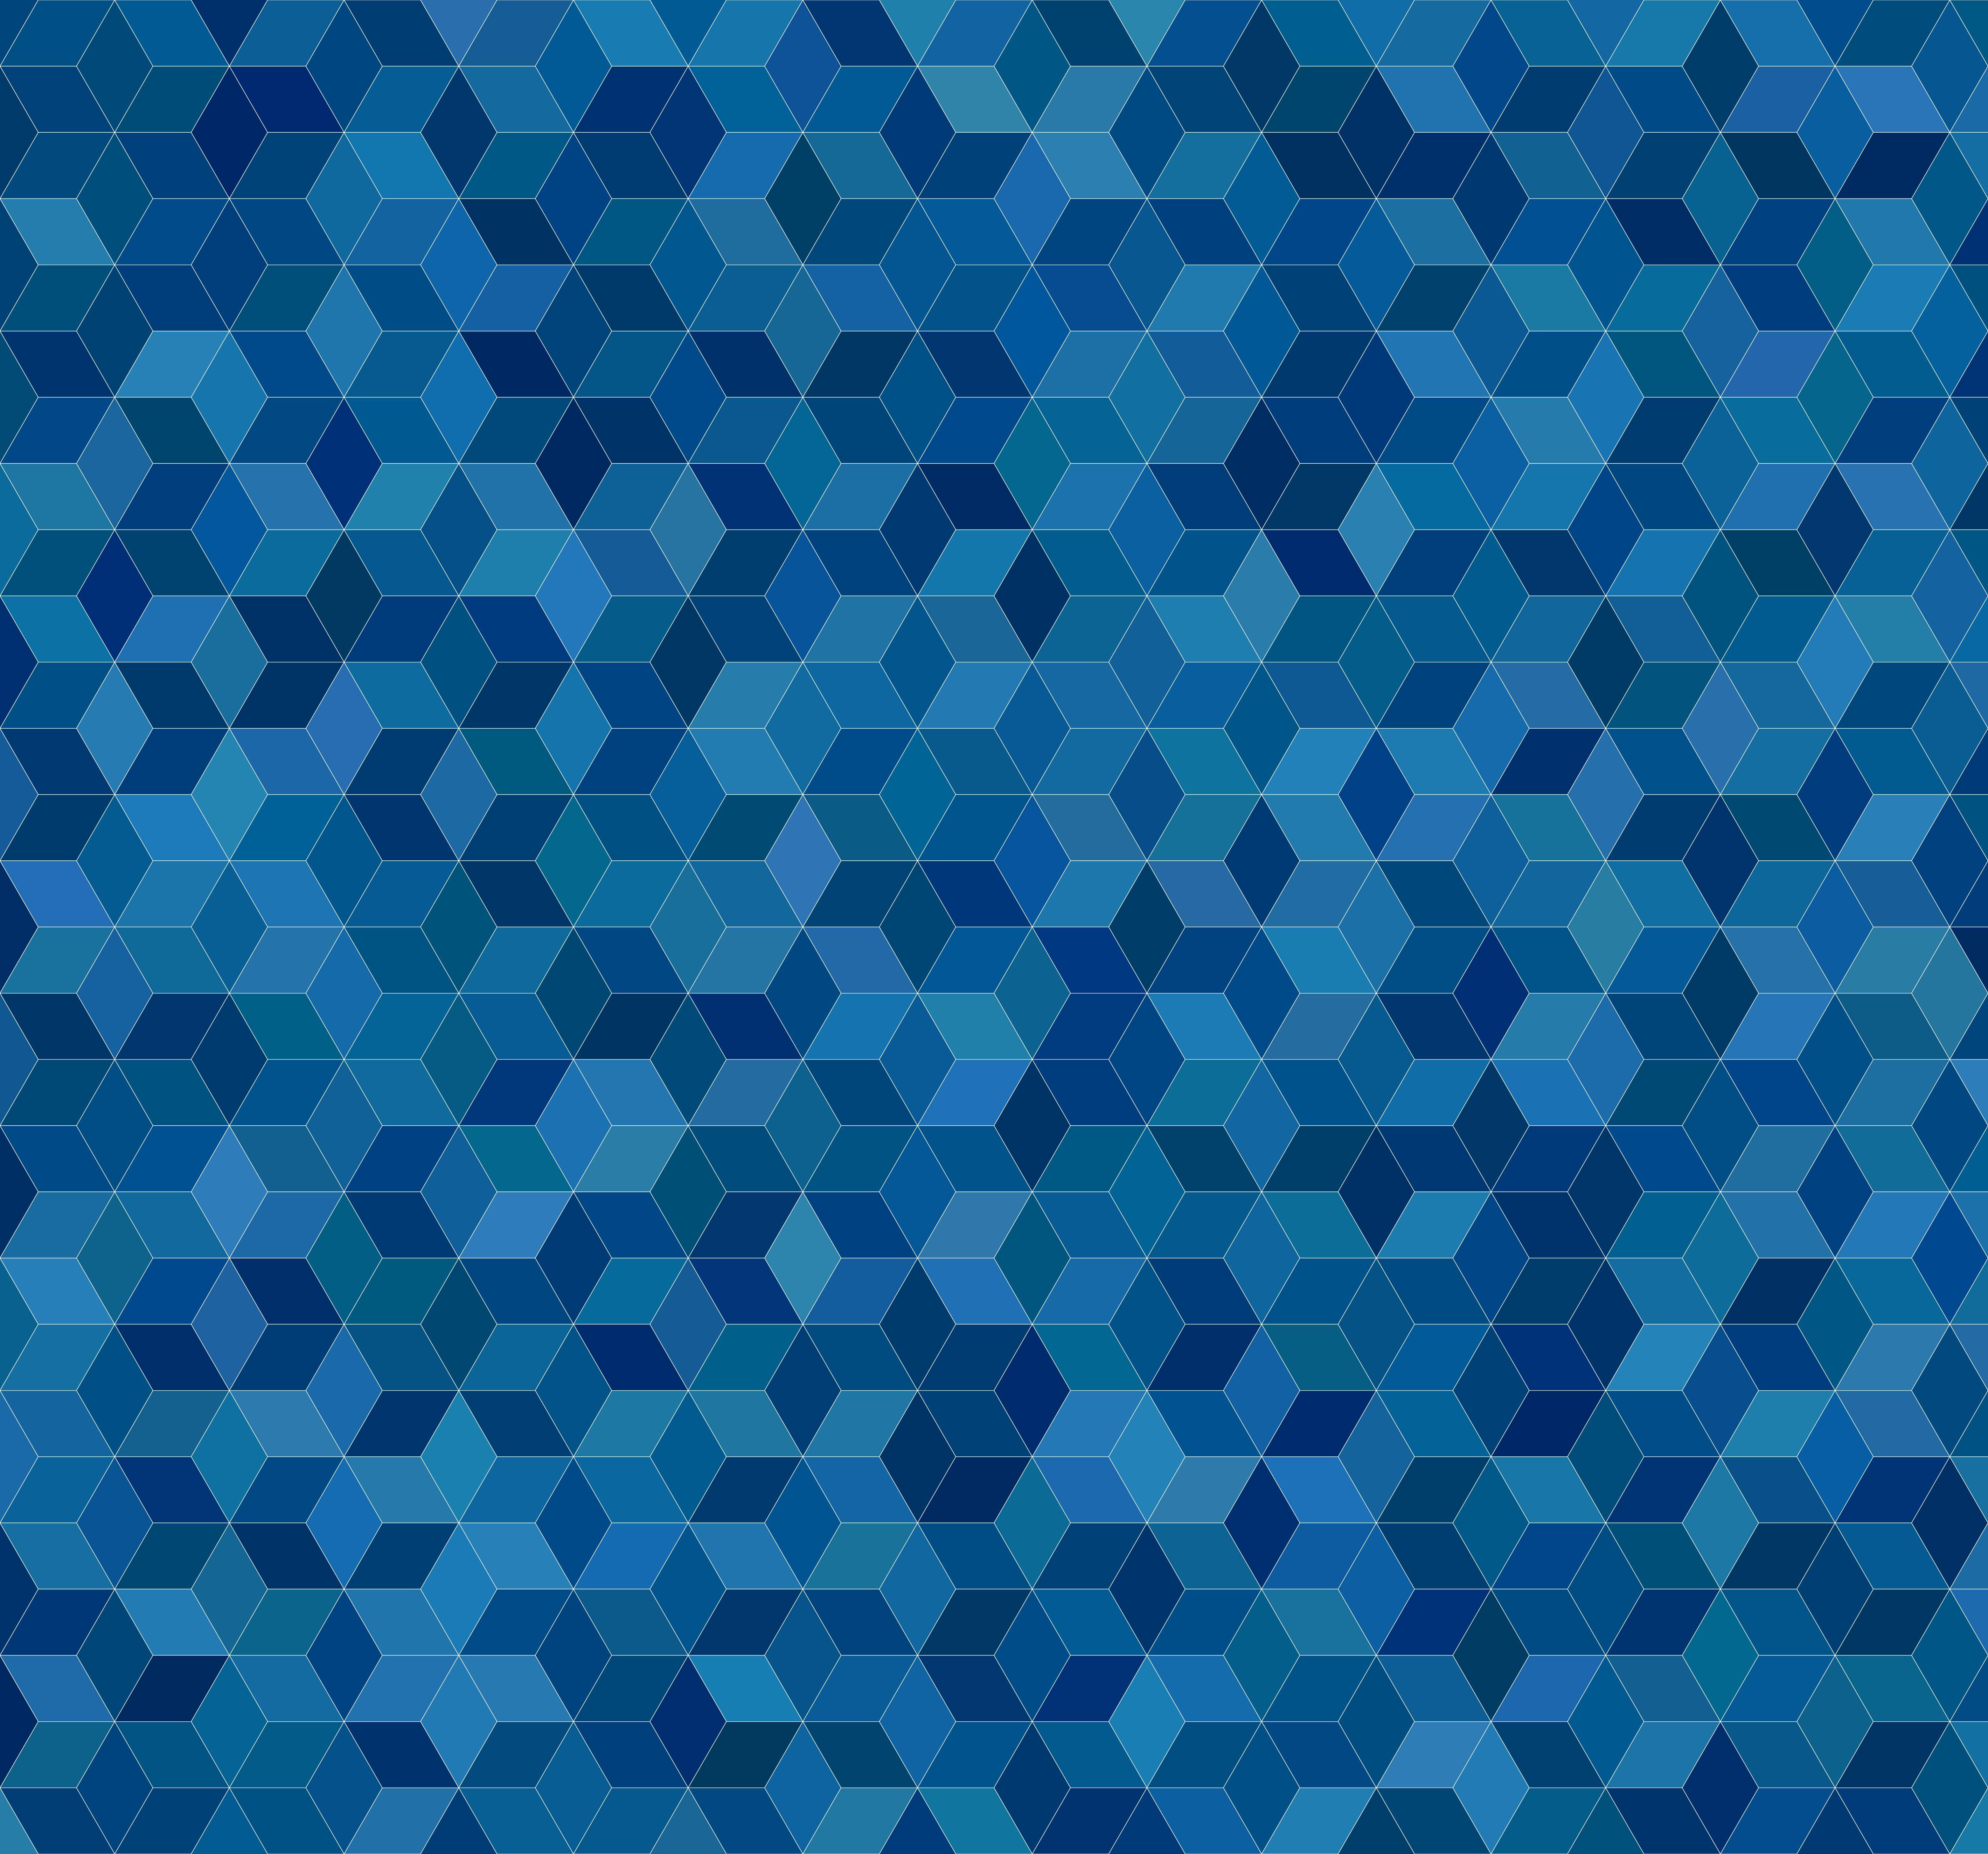 3840x2160 Polygons Abstract Patterns 5k 4k HD 4k